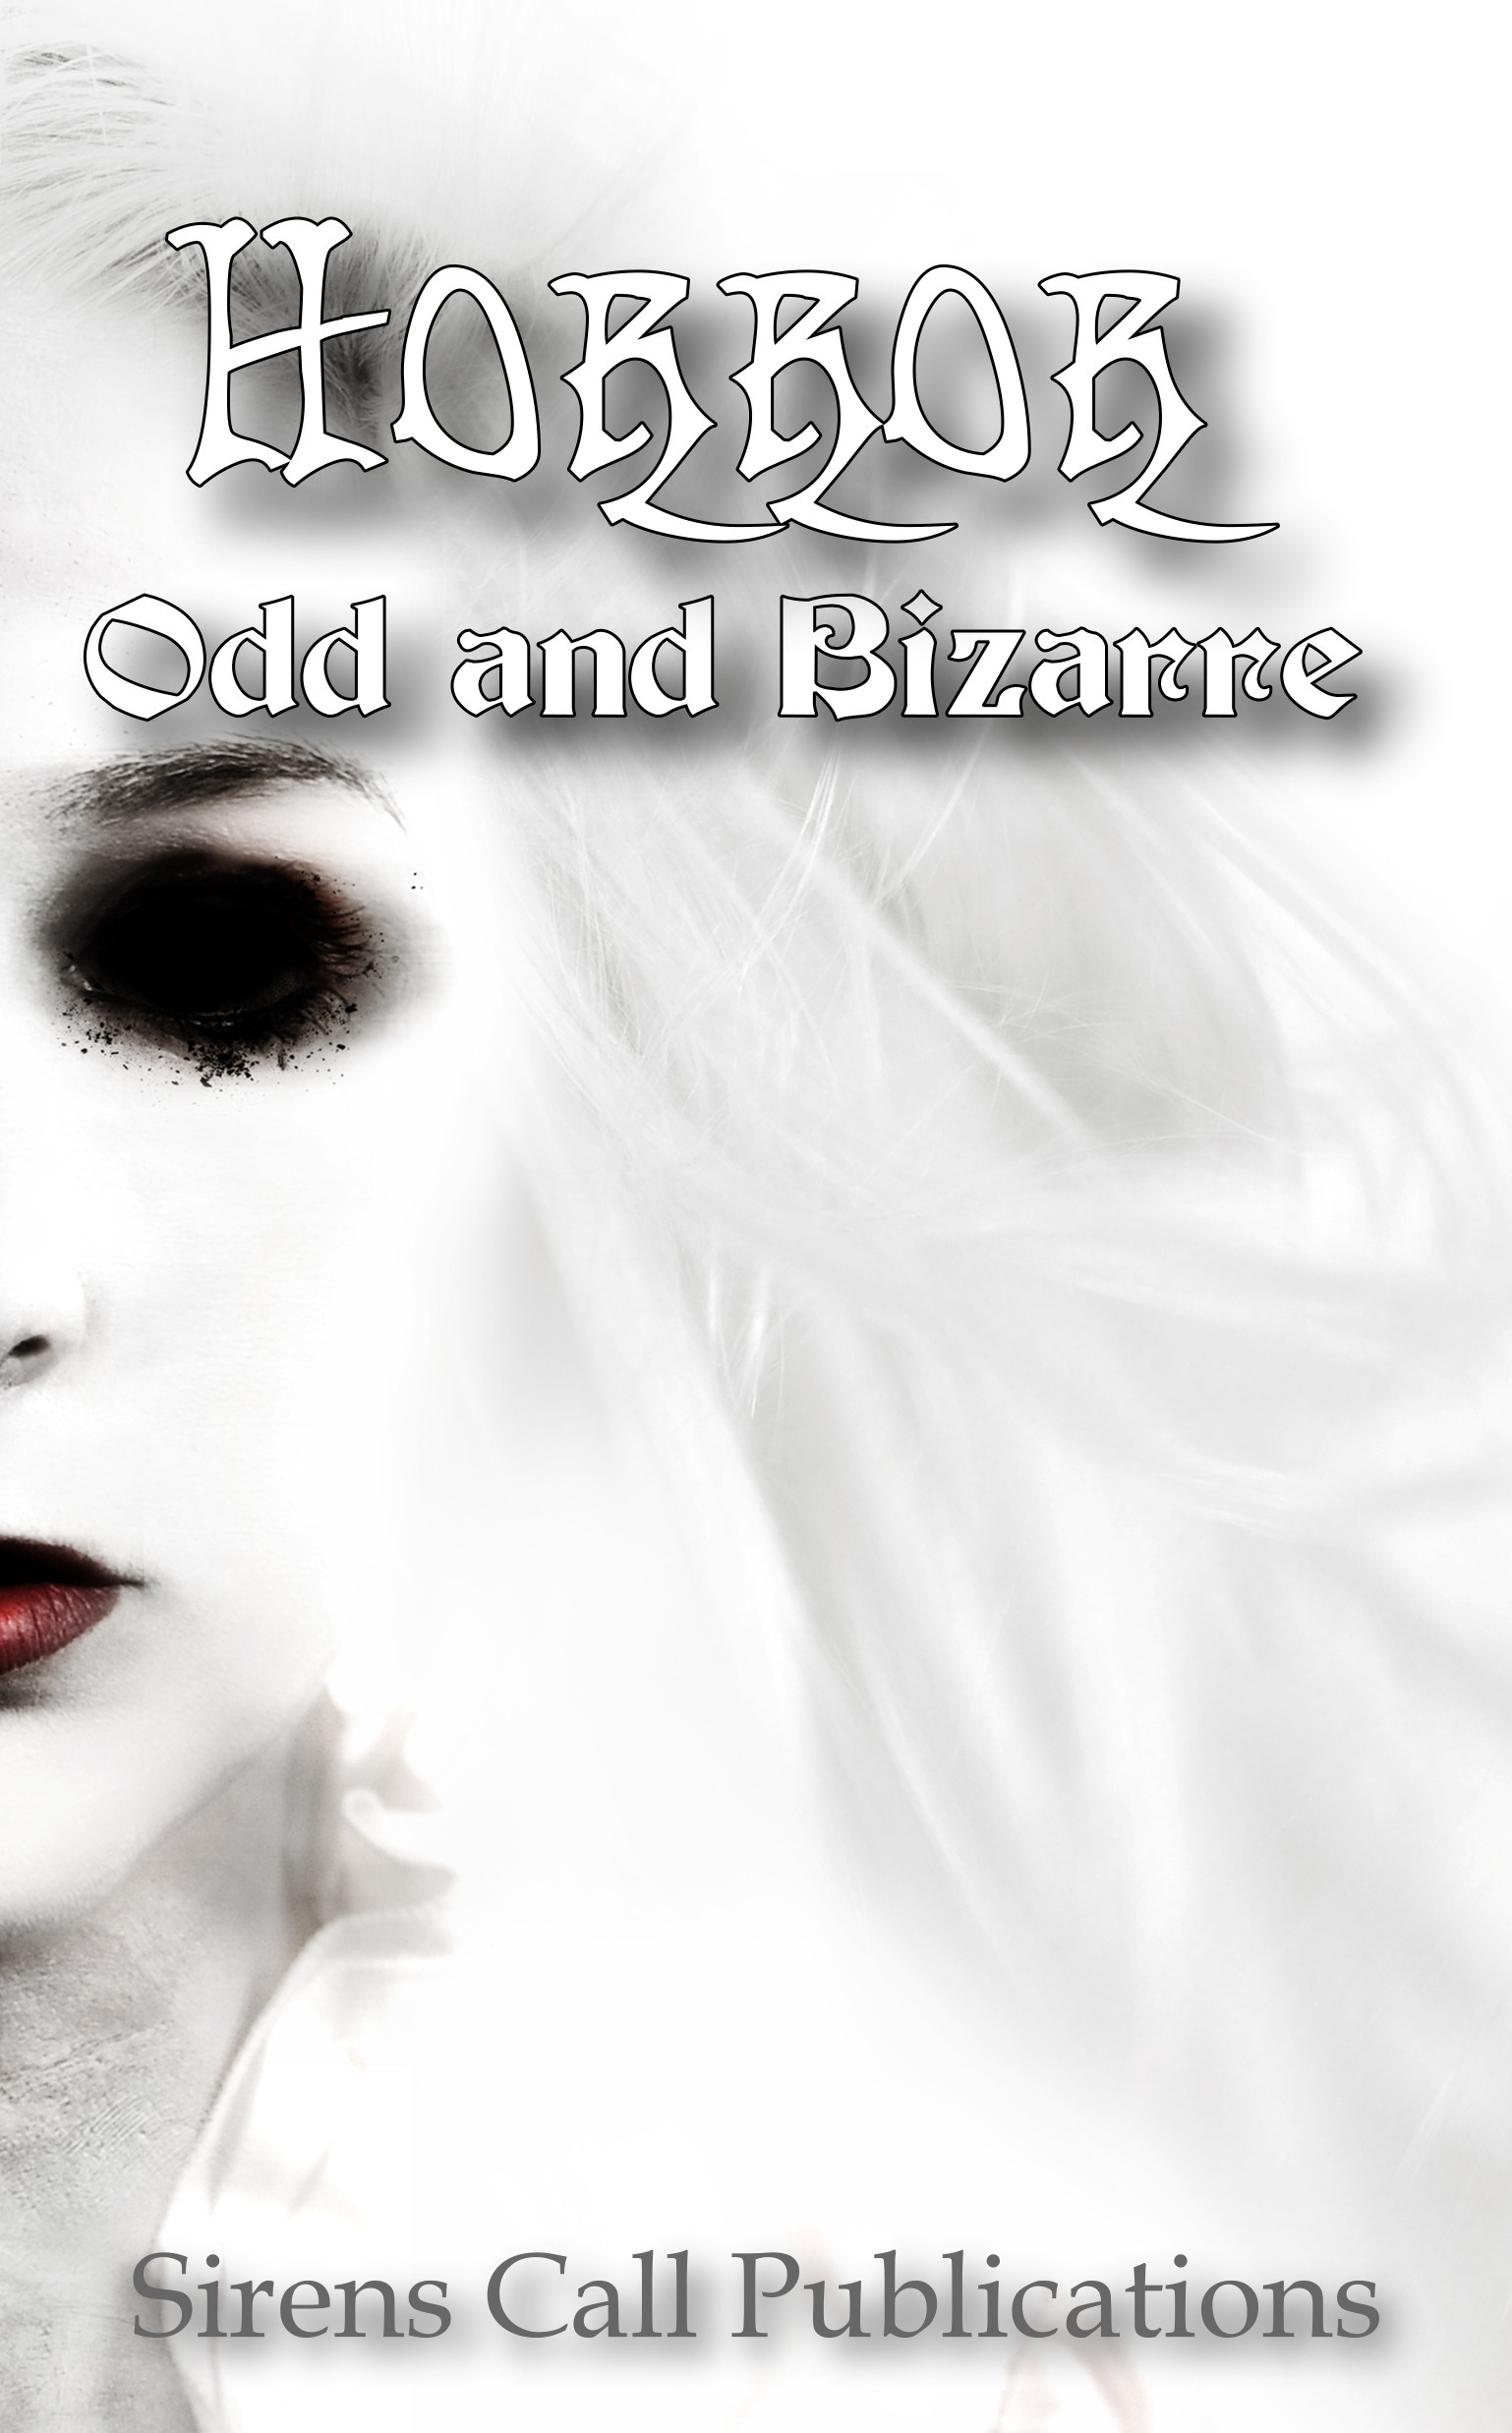 Horror: Odd and Bizarre Sirens Call Publications